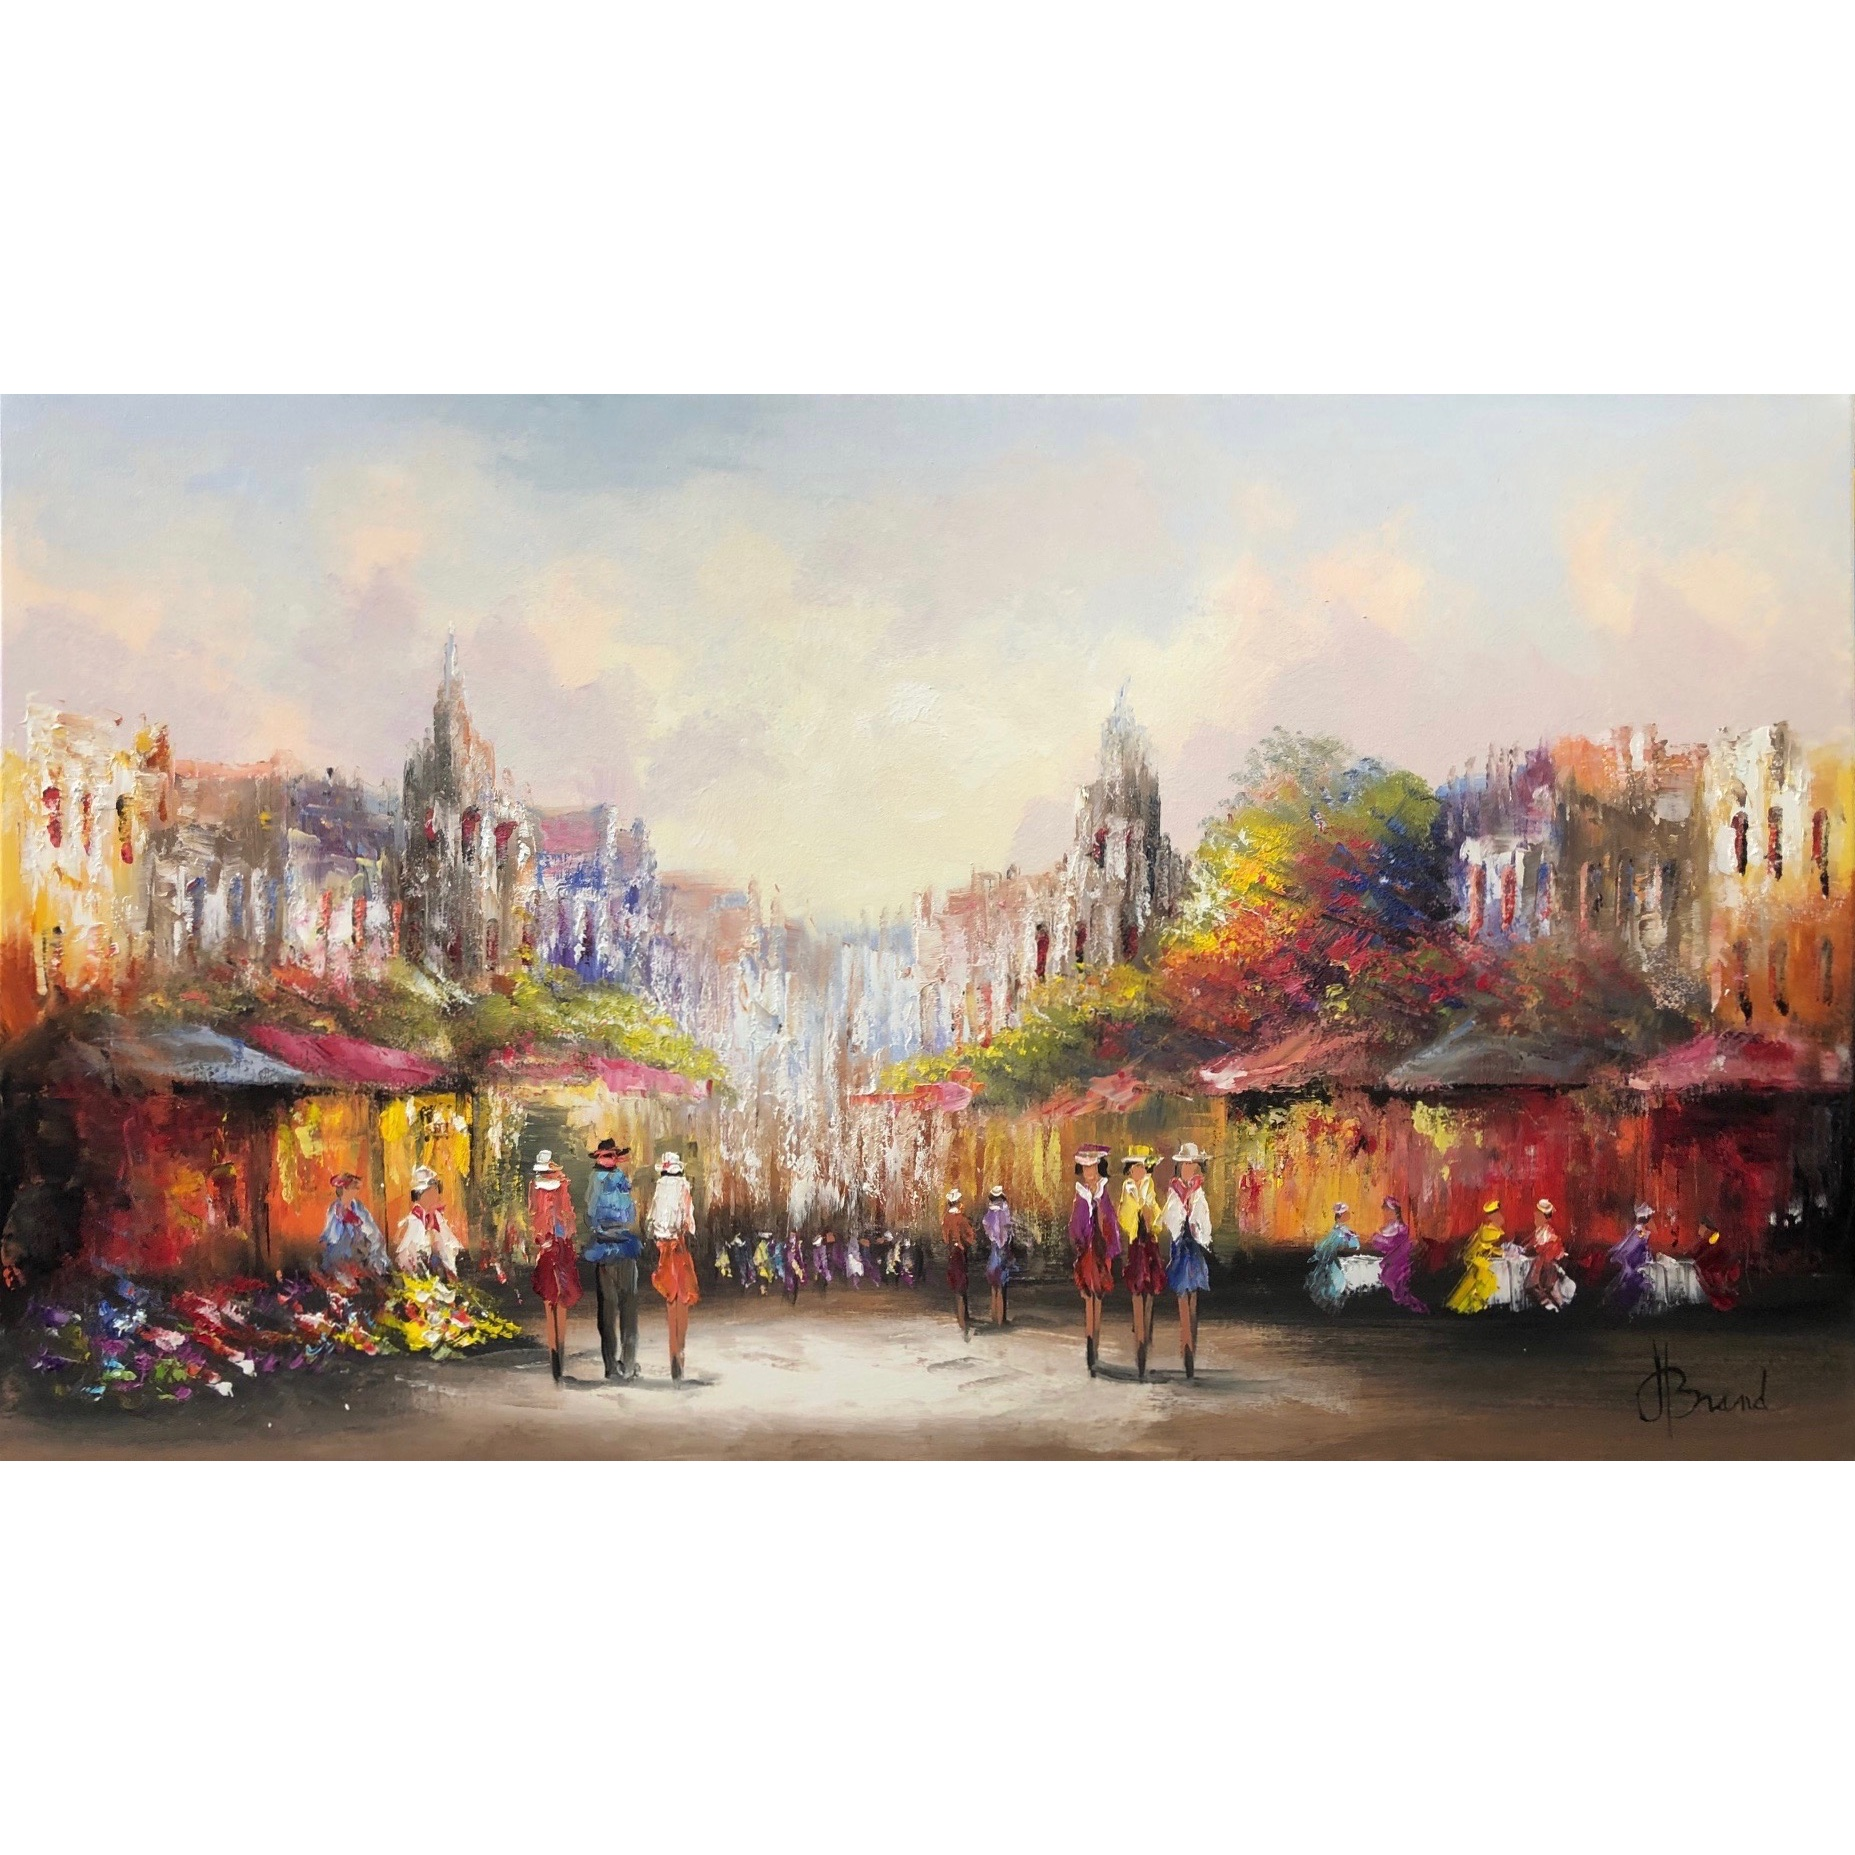 Henry Brand schilderij 'Flower Market'